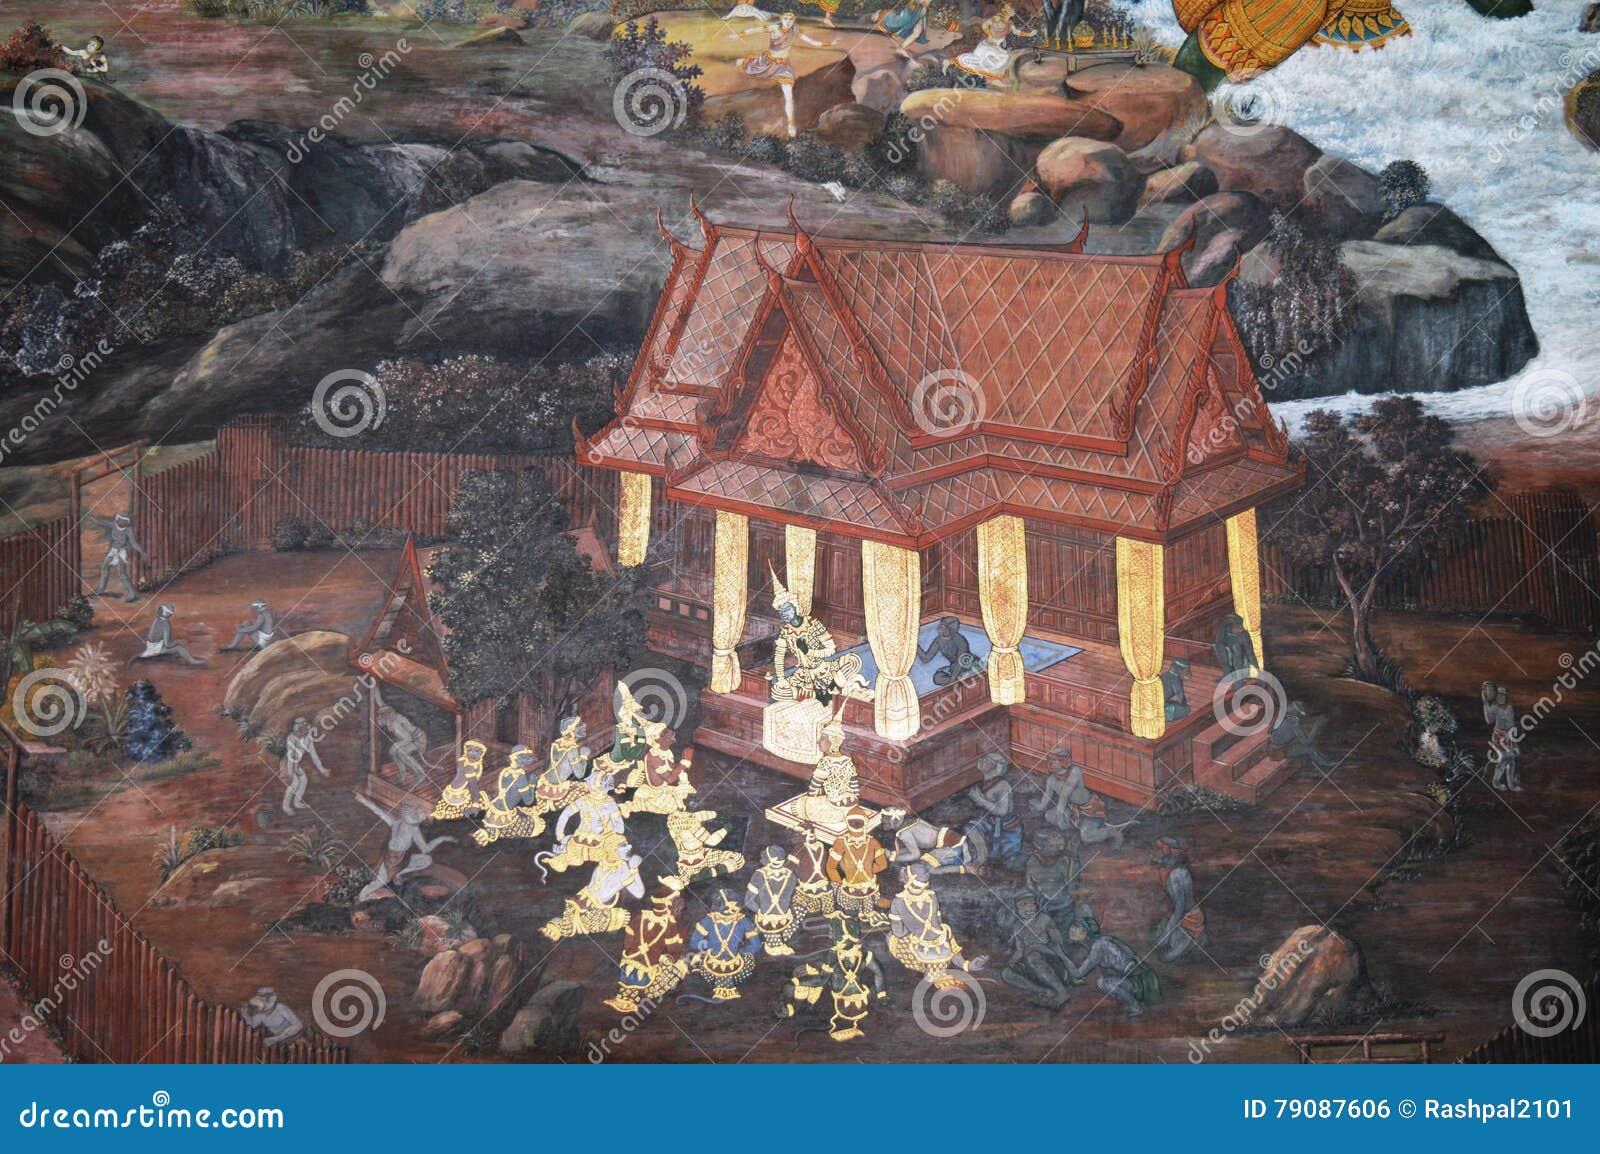 KINGS PALACE PAINTING ON THE WALL IN BANGKOK THAILAND